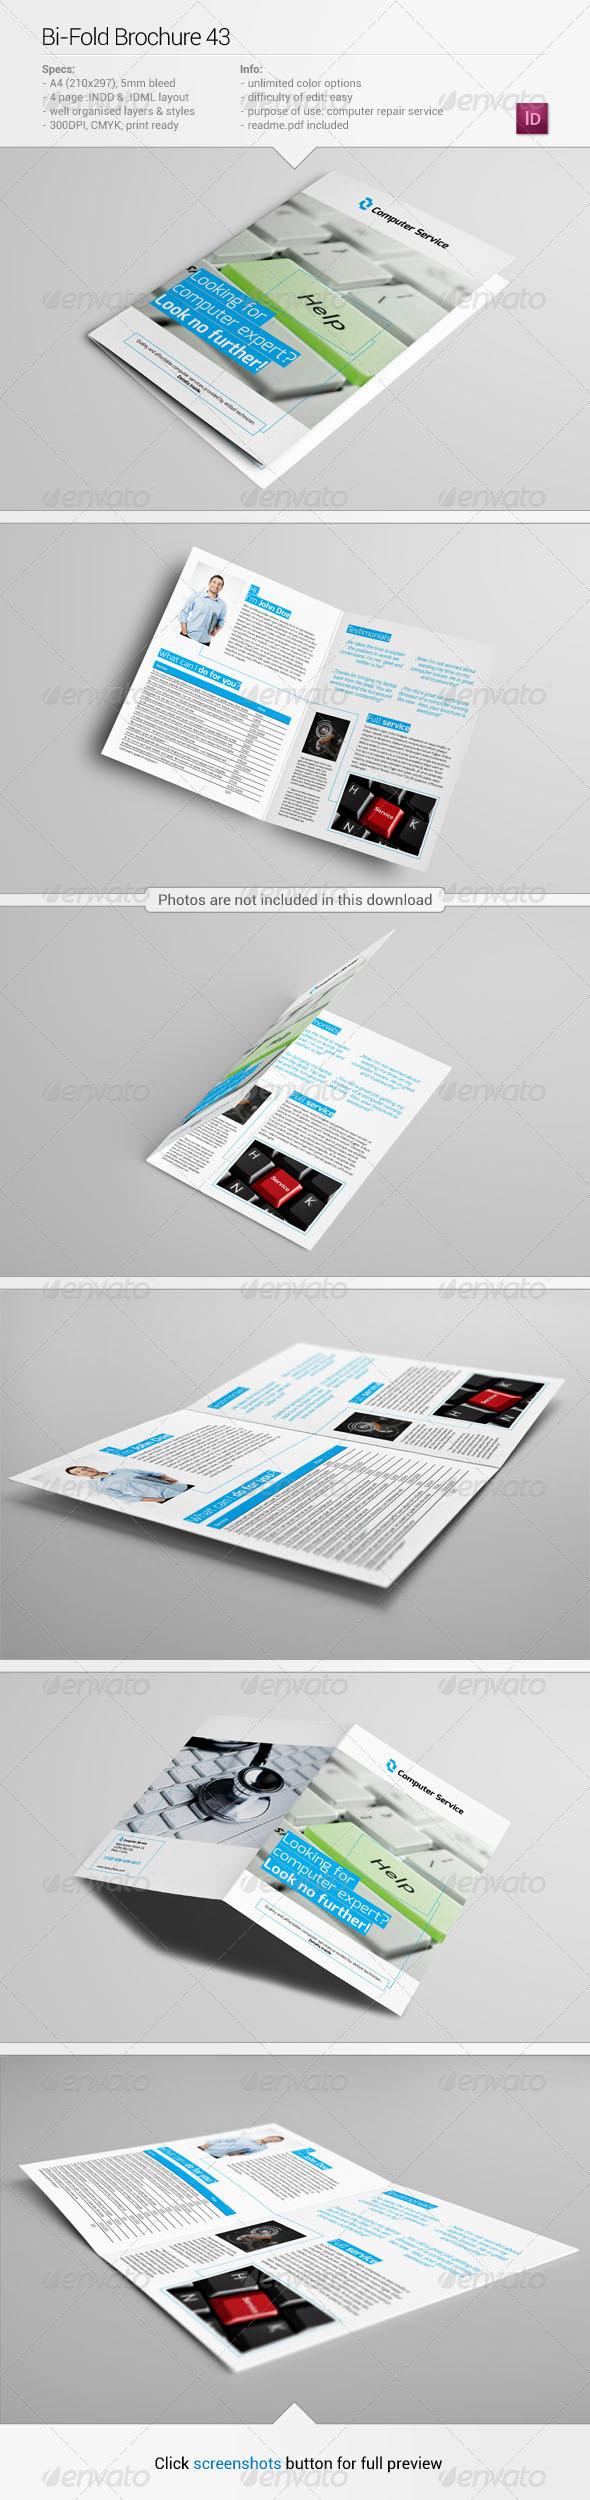 Bi-Fold Brochure 43 - Informational Brochures